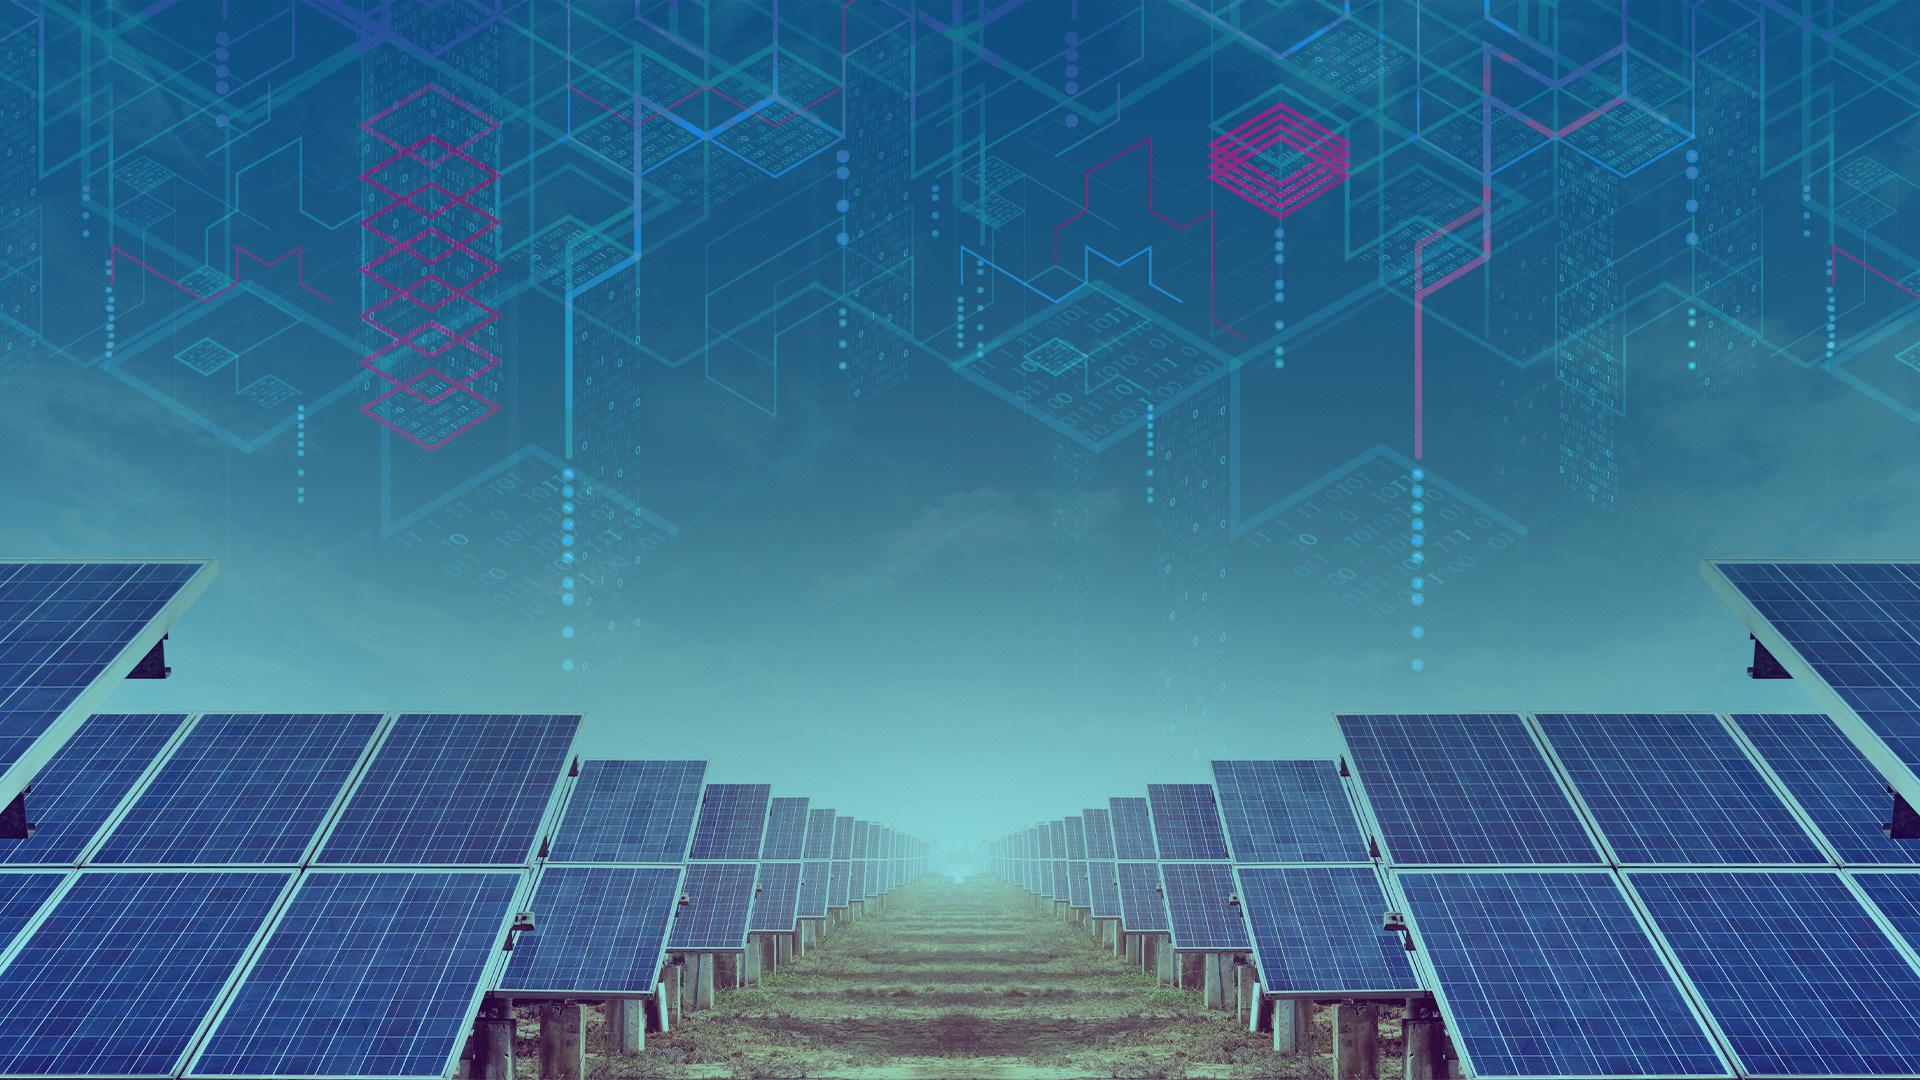 Energie, Strom, Stromversorgung, Solar, Solarzelle, Stromnetz, Solarenergie, Solarpanel, Solarzellen, Solarmodul, Photovoltaik, Solarstrom, SolarCity, Solaranlage, Solarfeld, Solarpark, Sonnenenergie